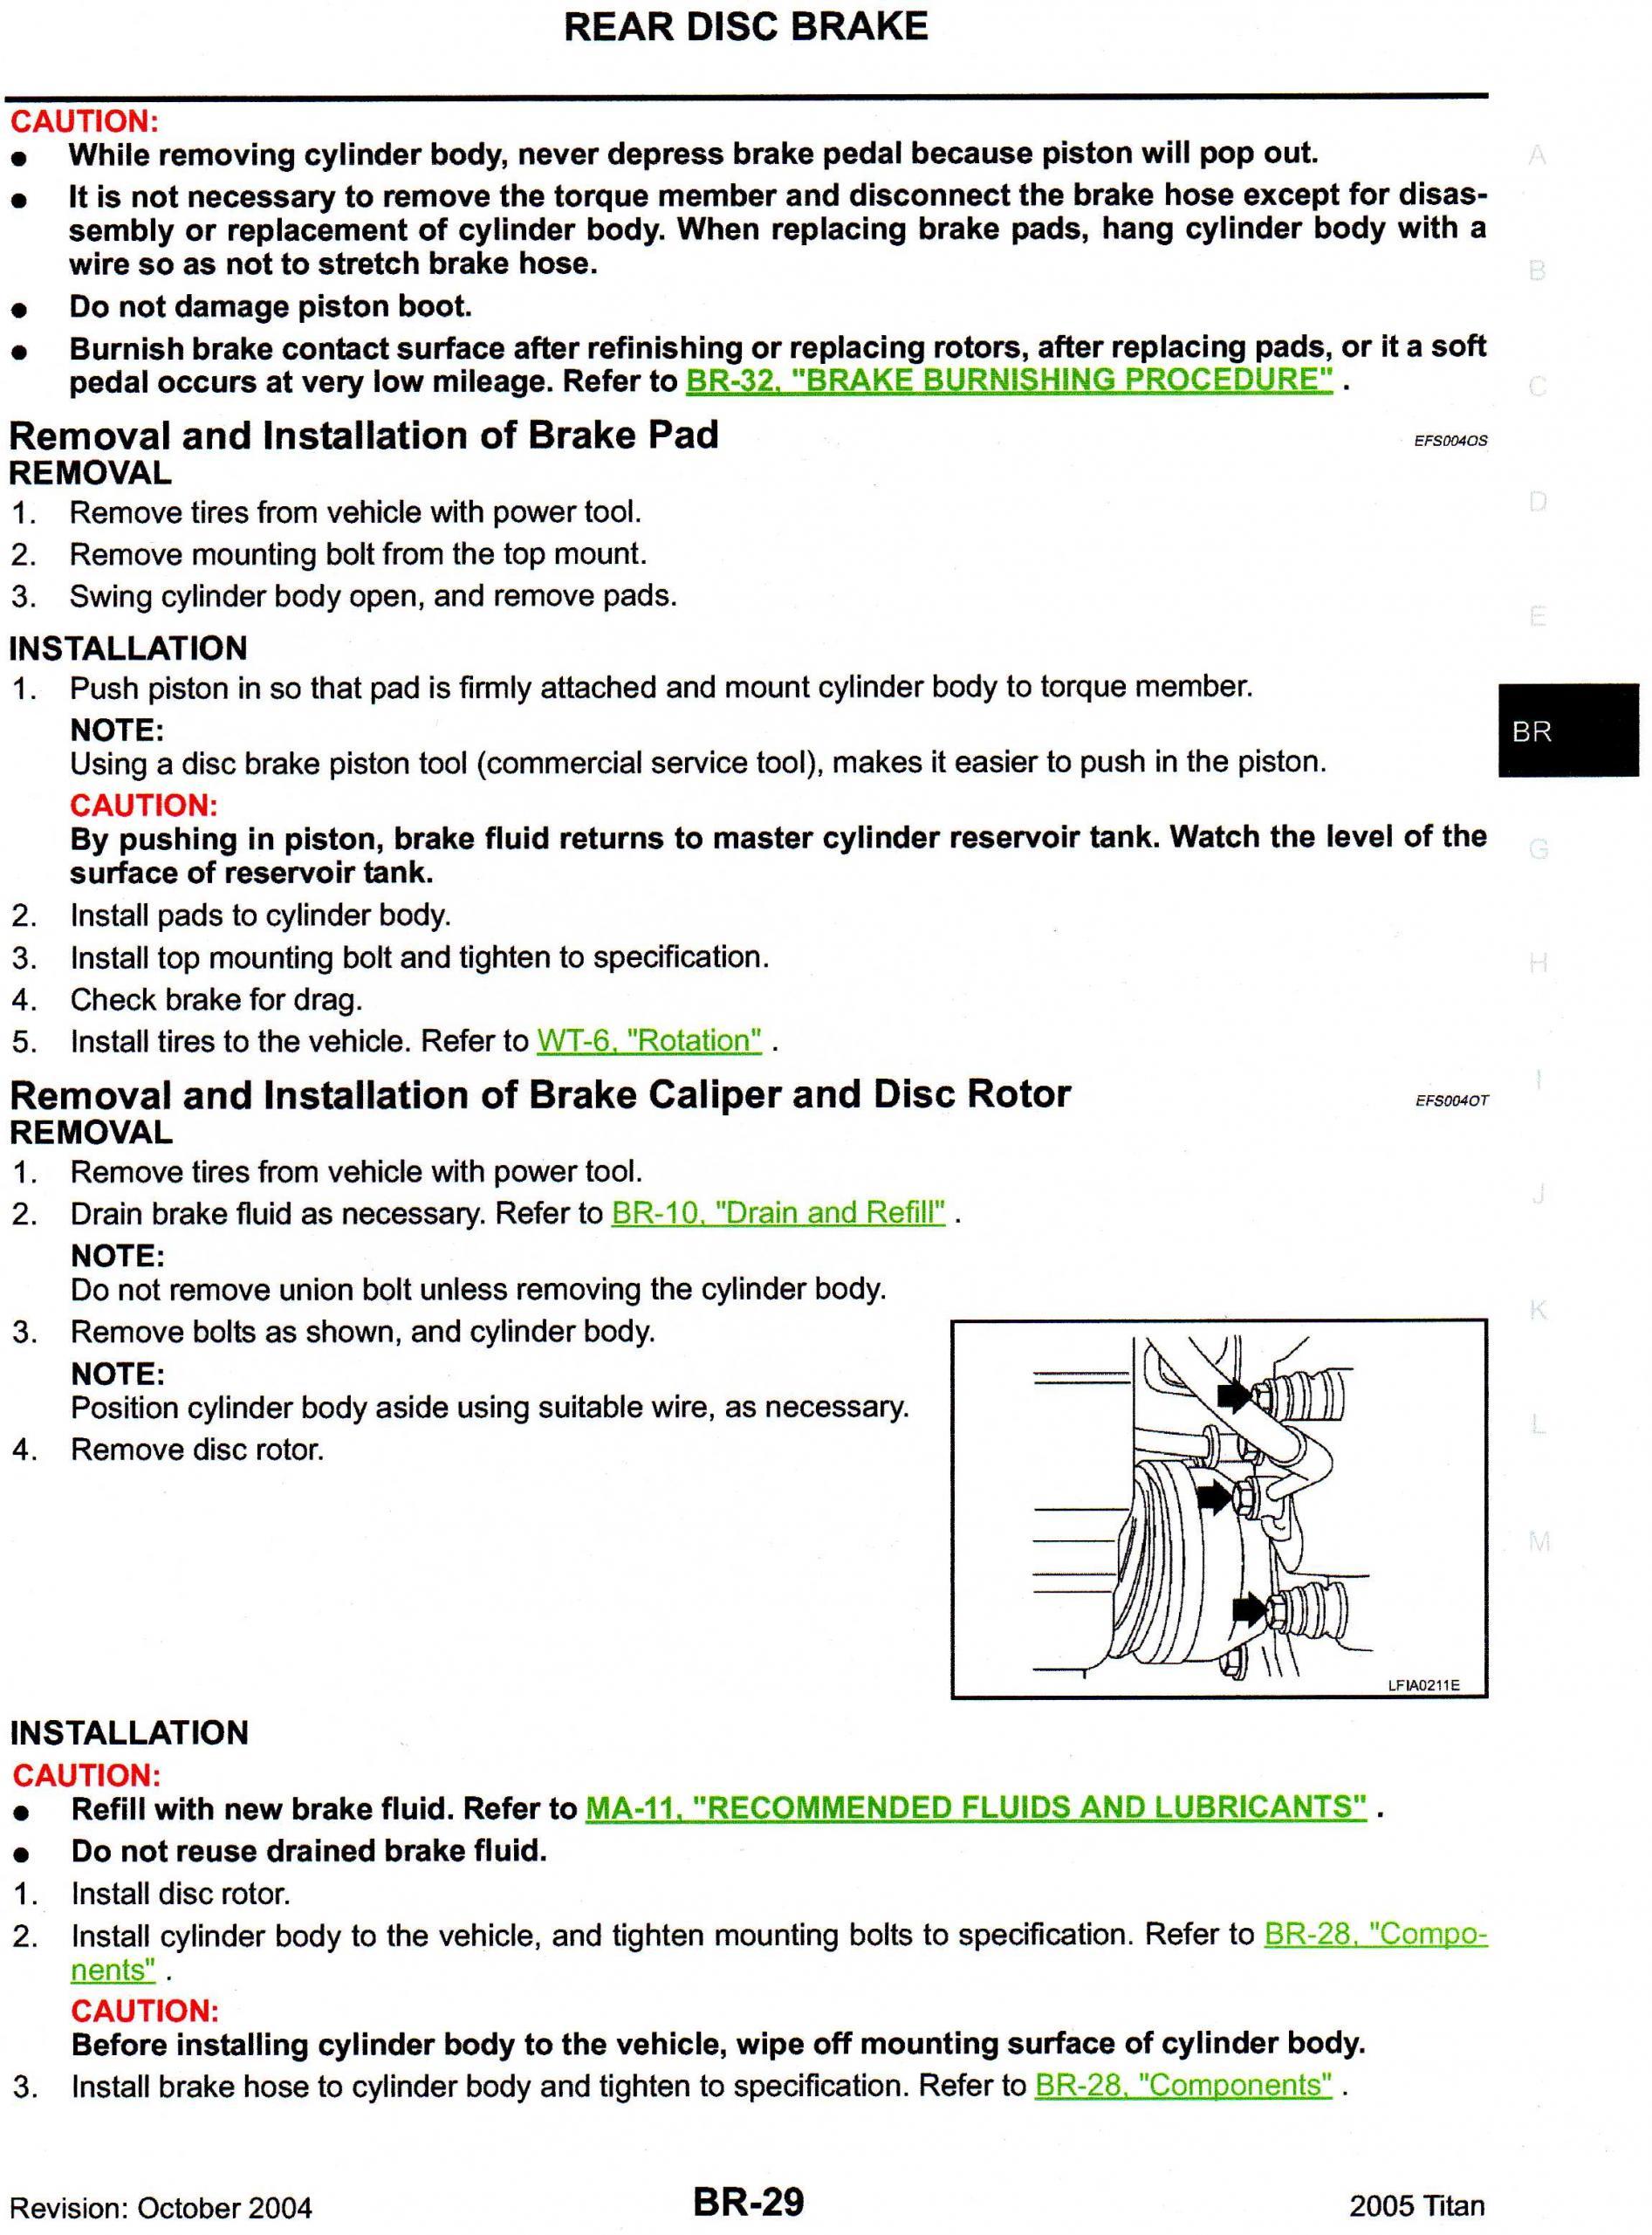 Replacing rear brakes-img005.jpg